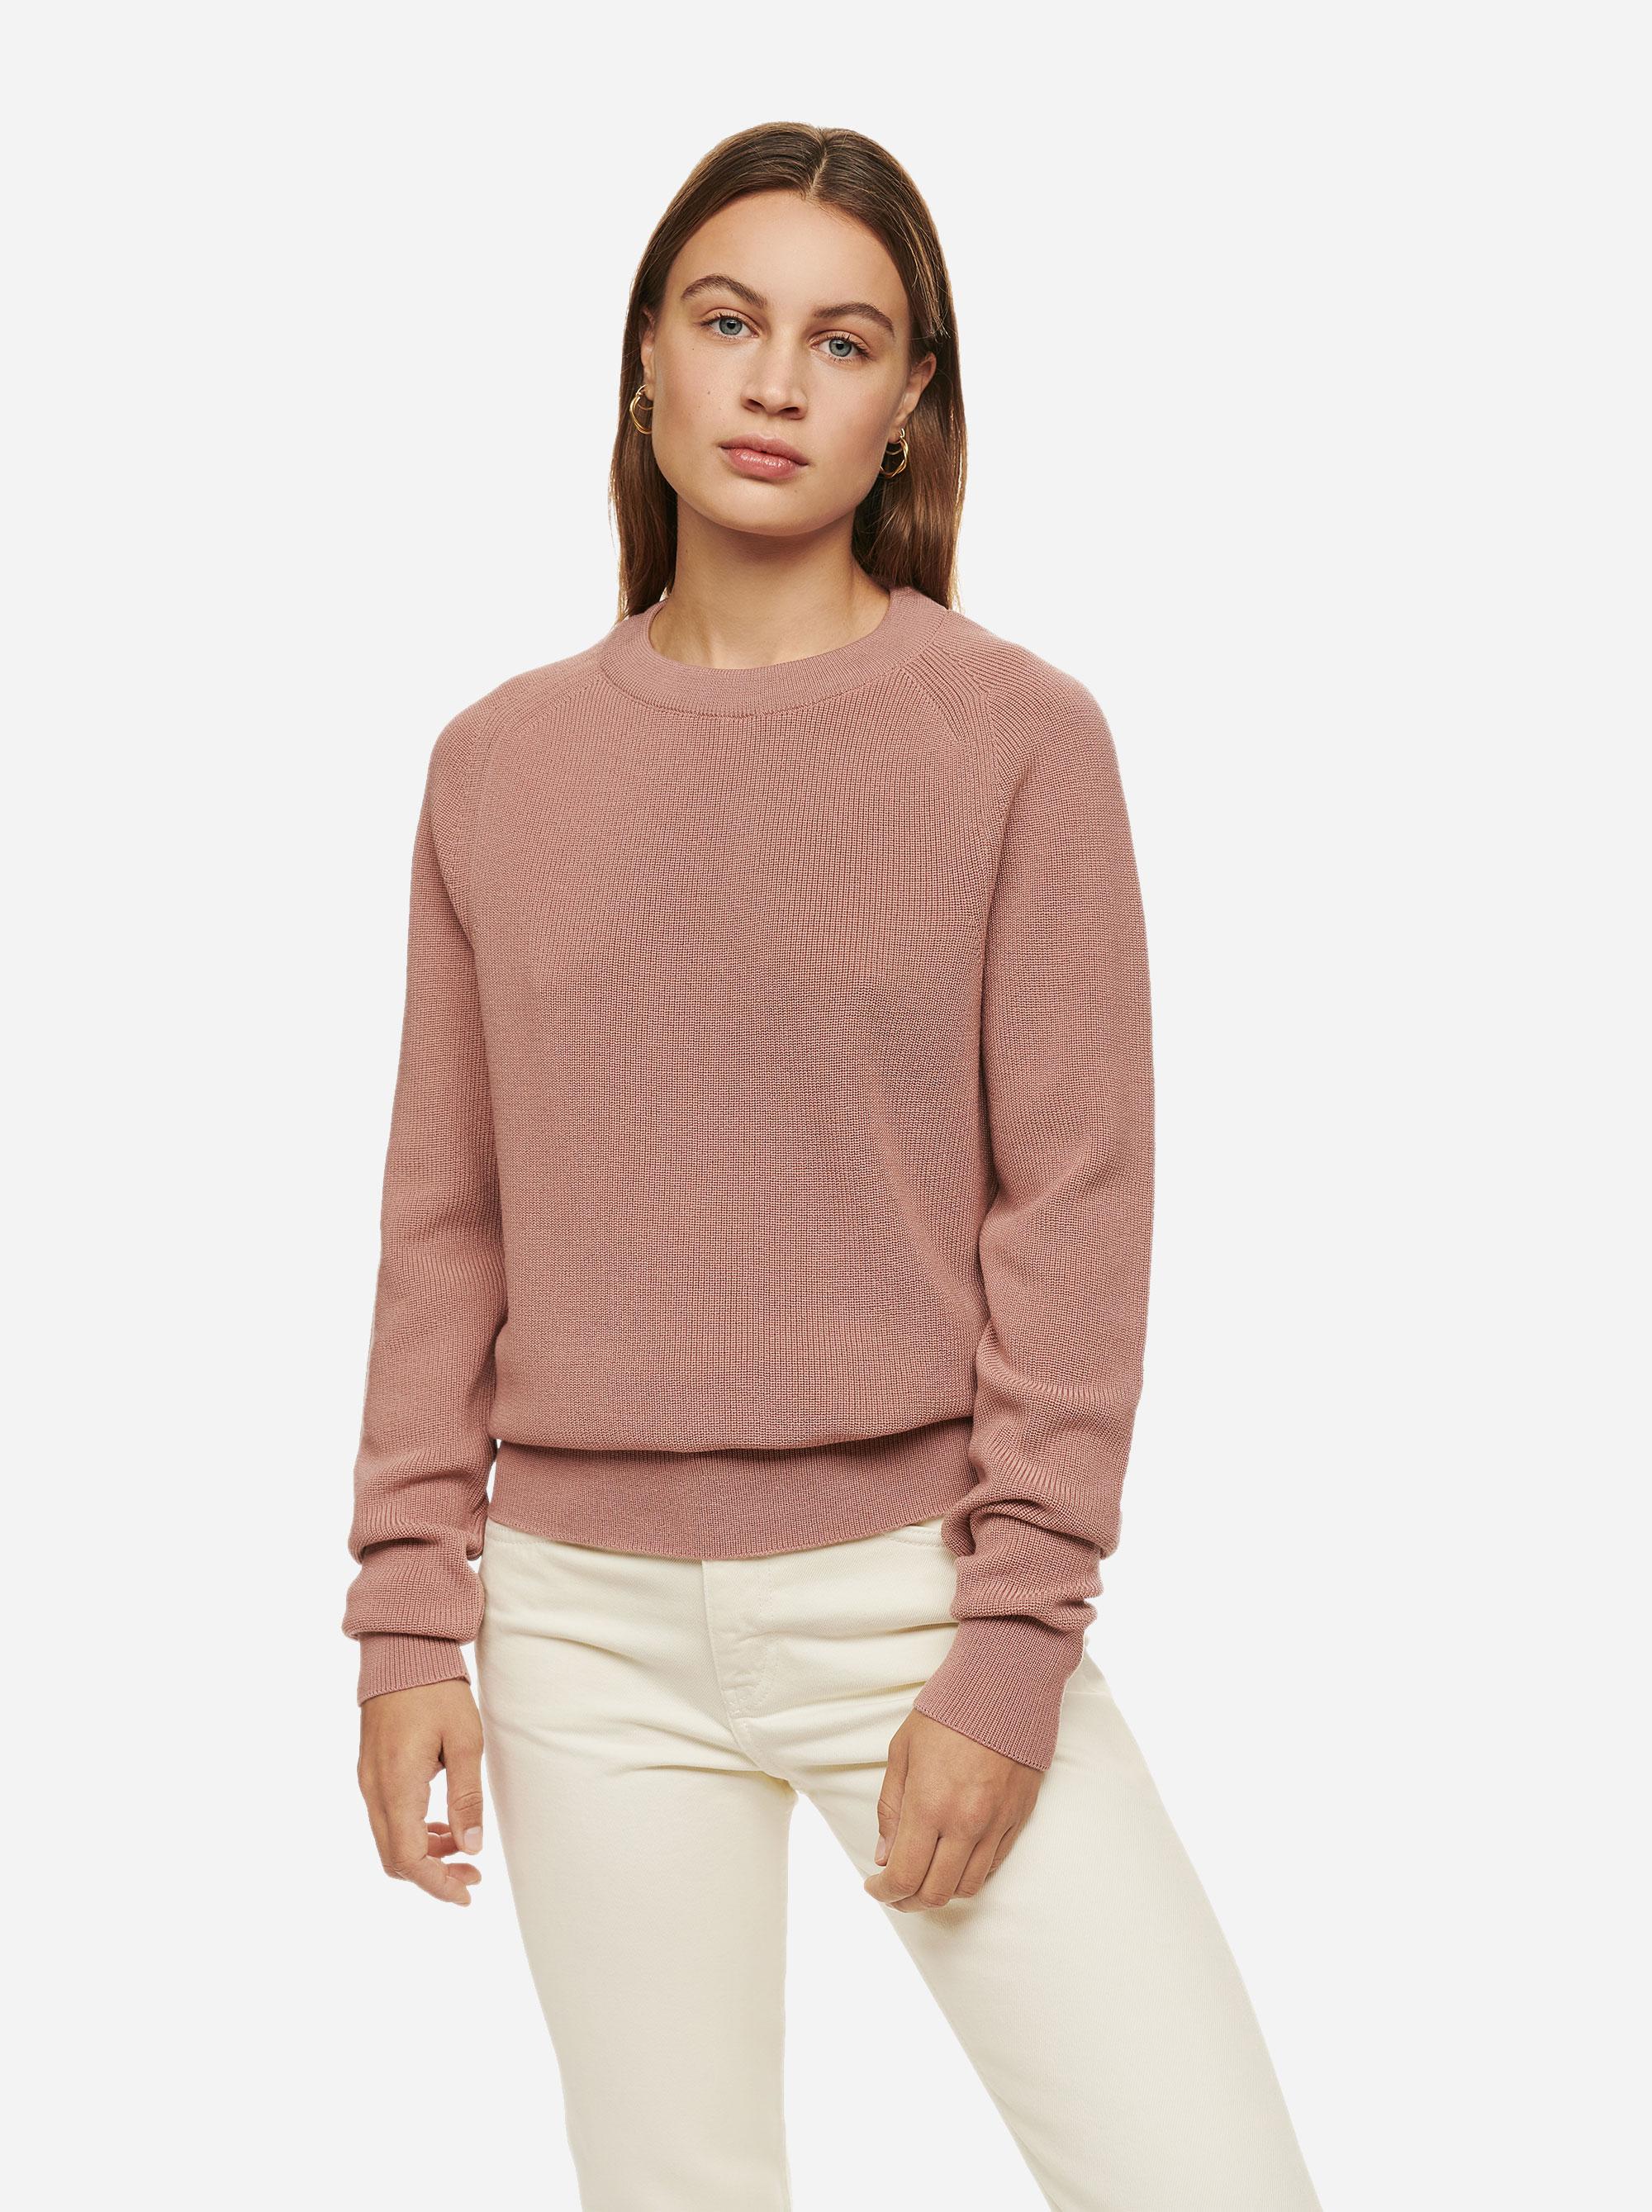 Teym - Crewneck - The Merino Sweater - Women - Pink - 1